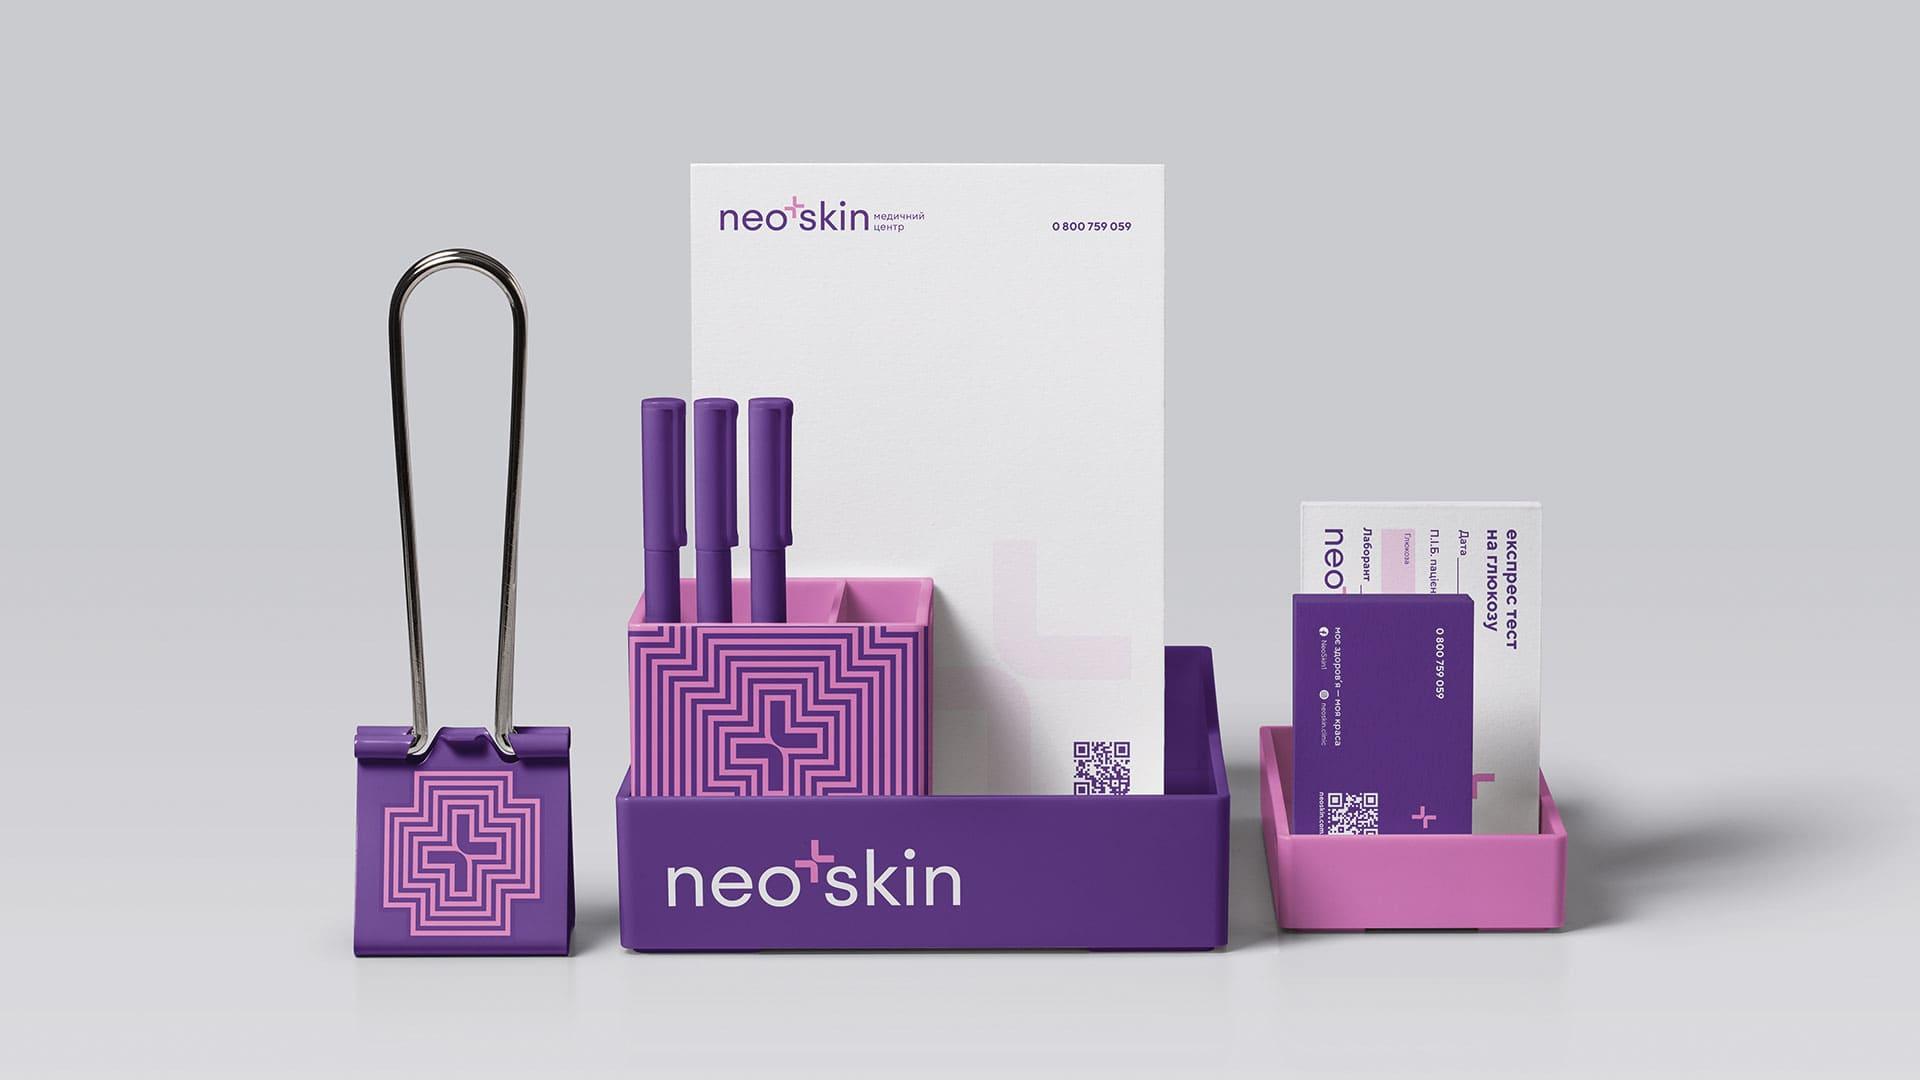 gra brand design neo skin 5